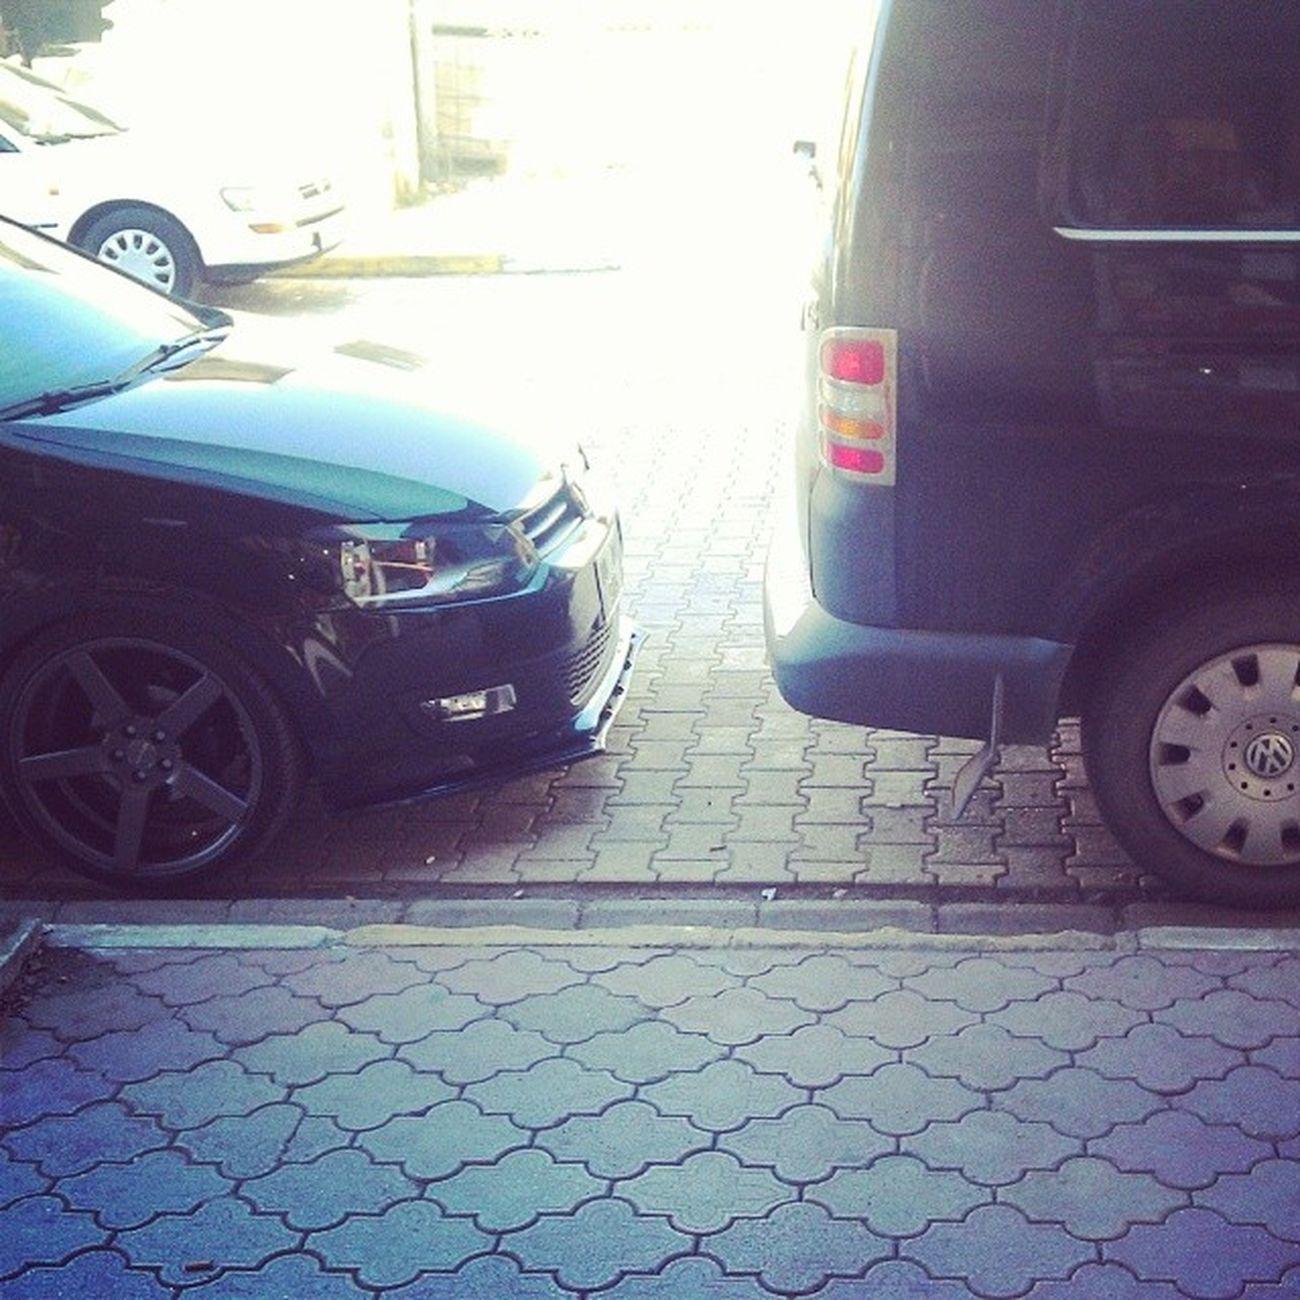 Baba Ogul ;) Volkswagen 6r t5 polo transporter blackandblack vossencv3 vossen vw vwpoloclub vwpolom Adana Osmaniye canon htc instagram igers dahaneolsun